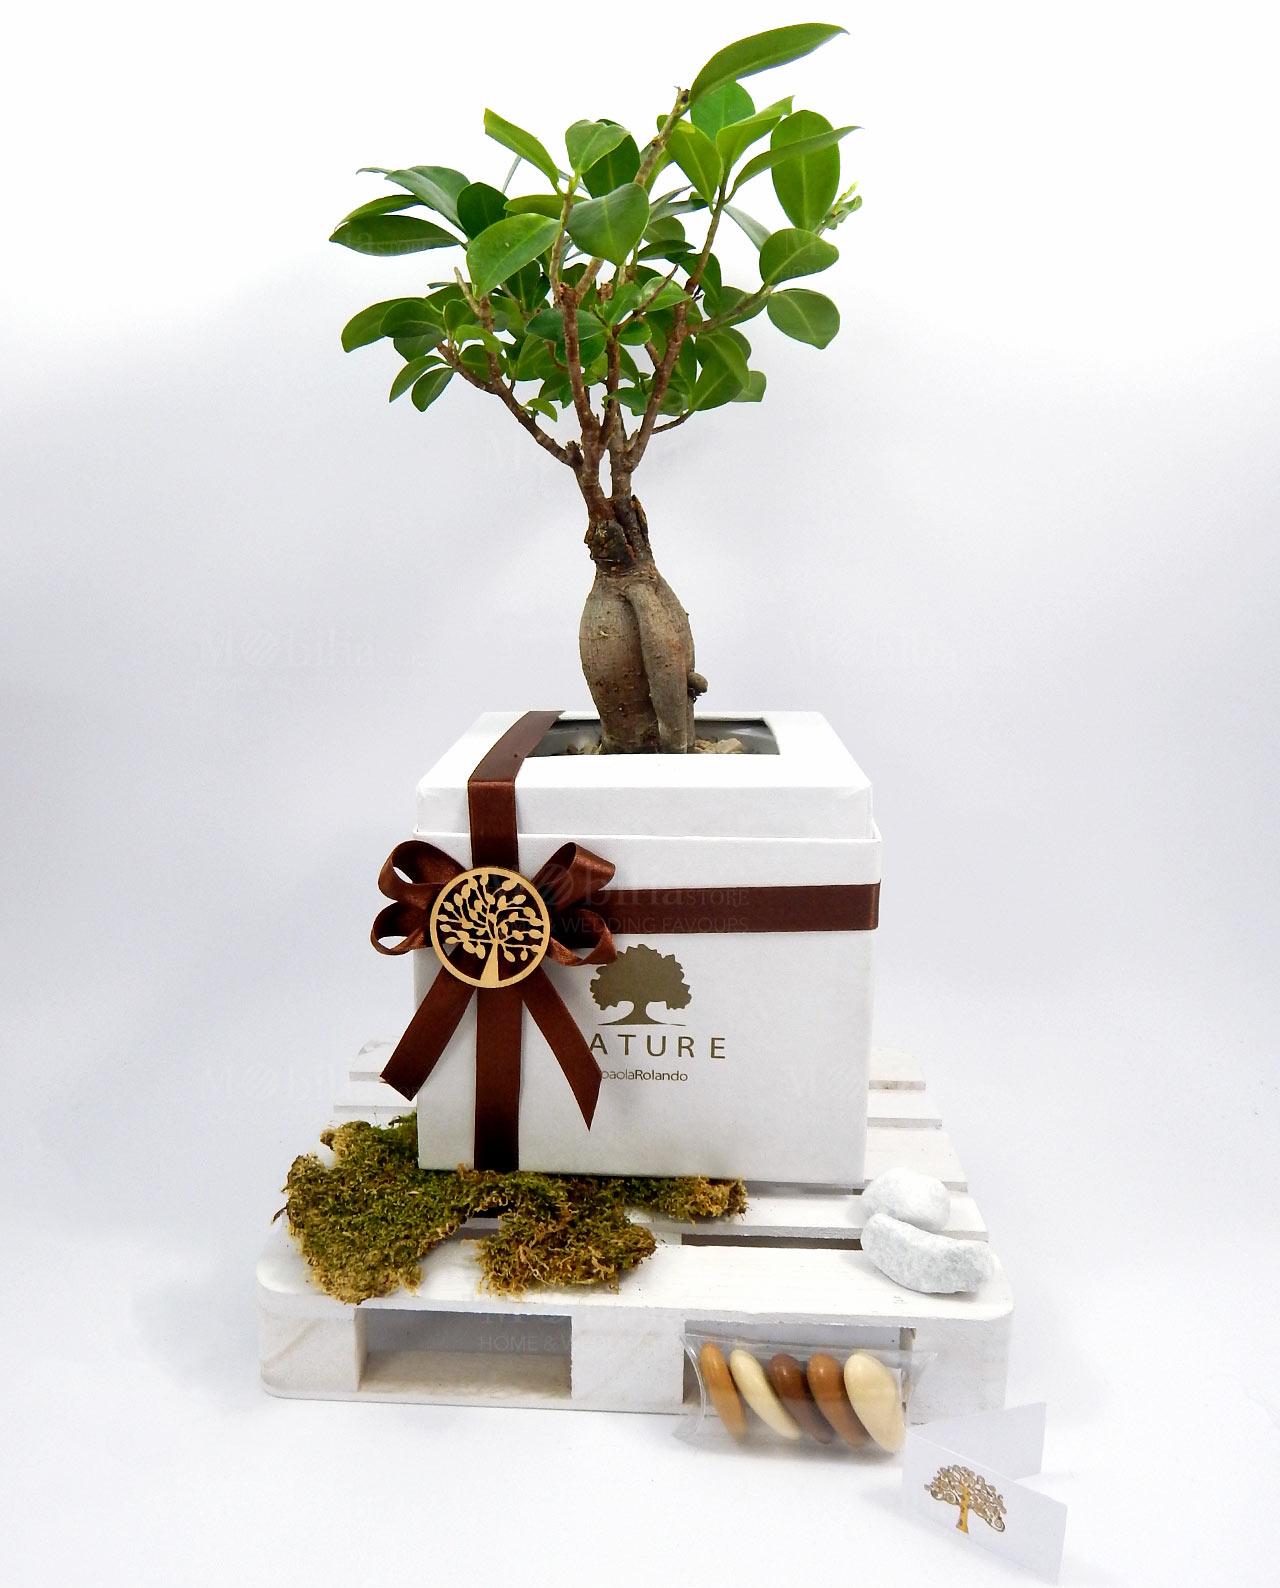 bomboniera boho chic bonsai ginseng paola rolando